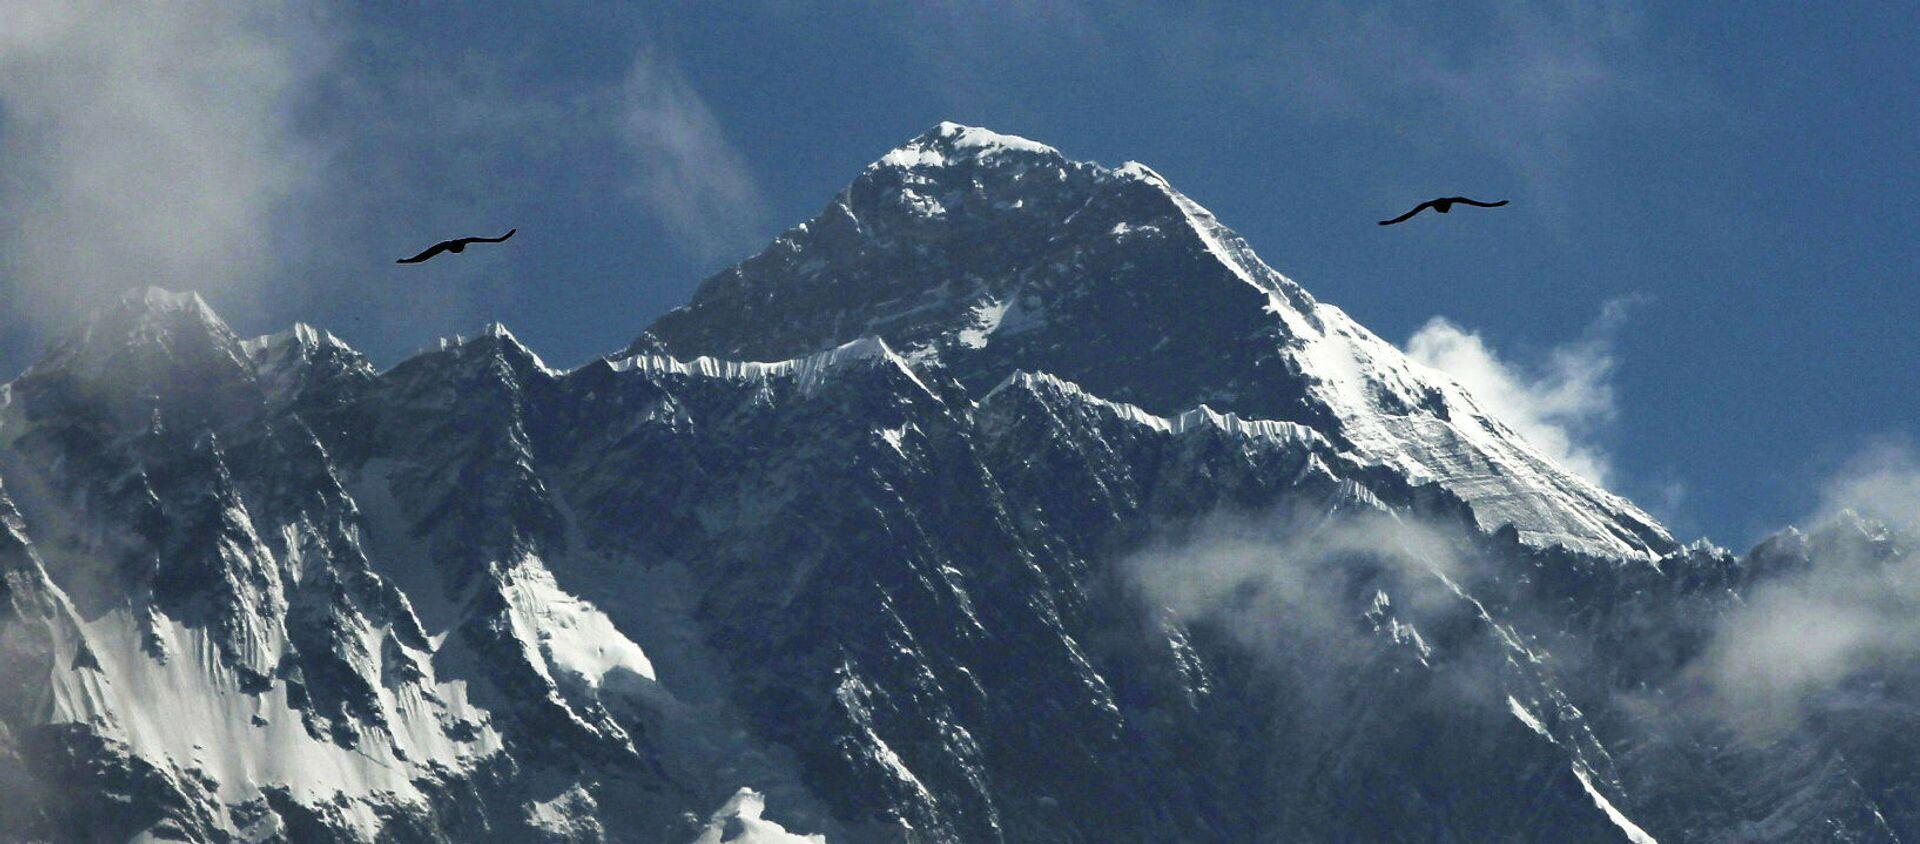 El monte Everest - Sputnik Mundo, 1920, 08.12.2020